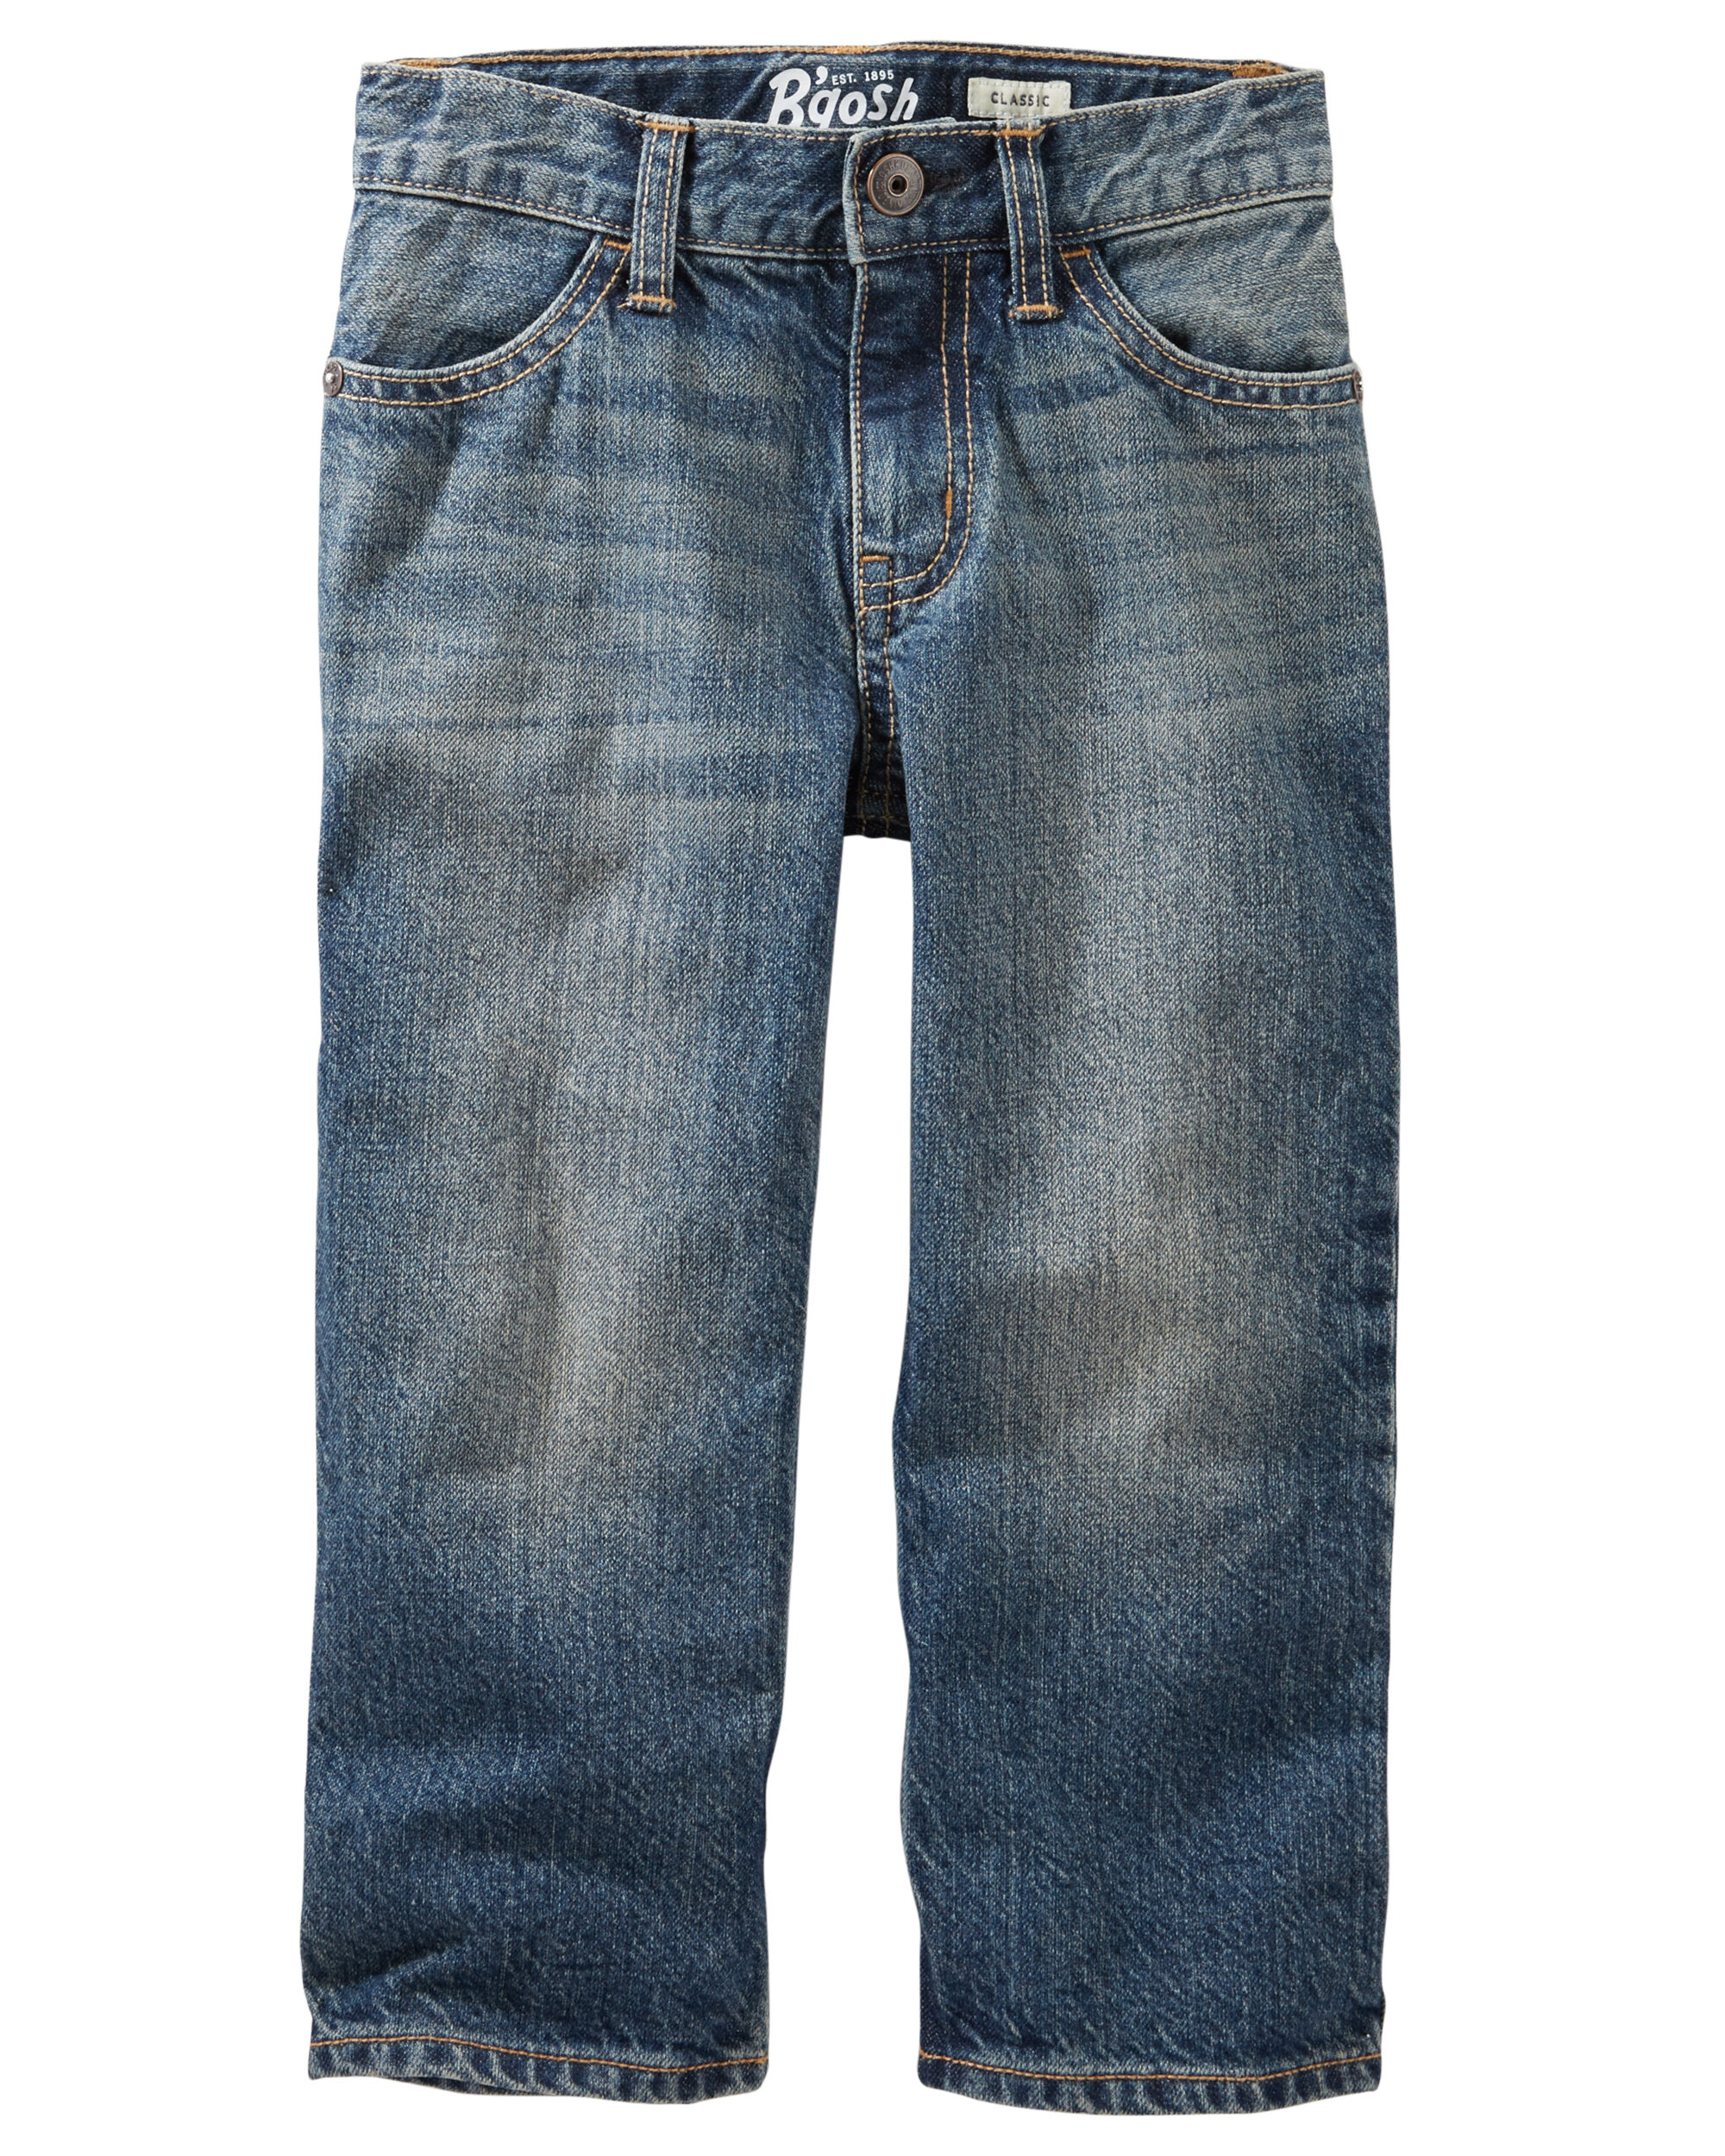 OshKosh BGosh Boys Classic Jeans